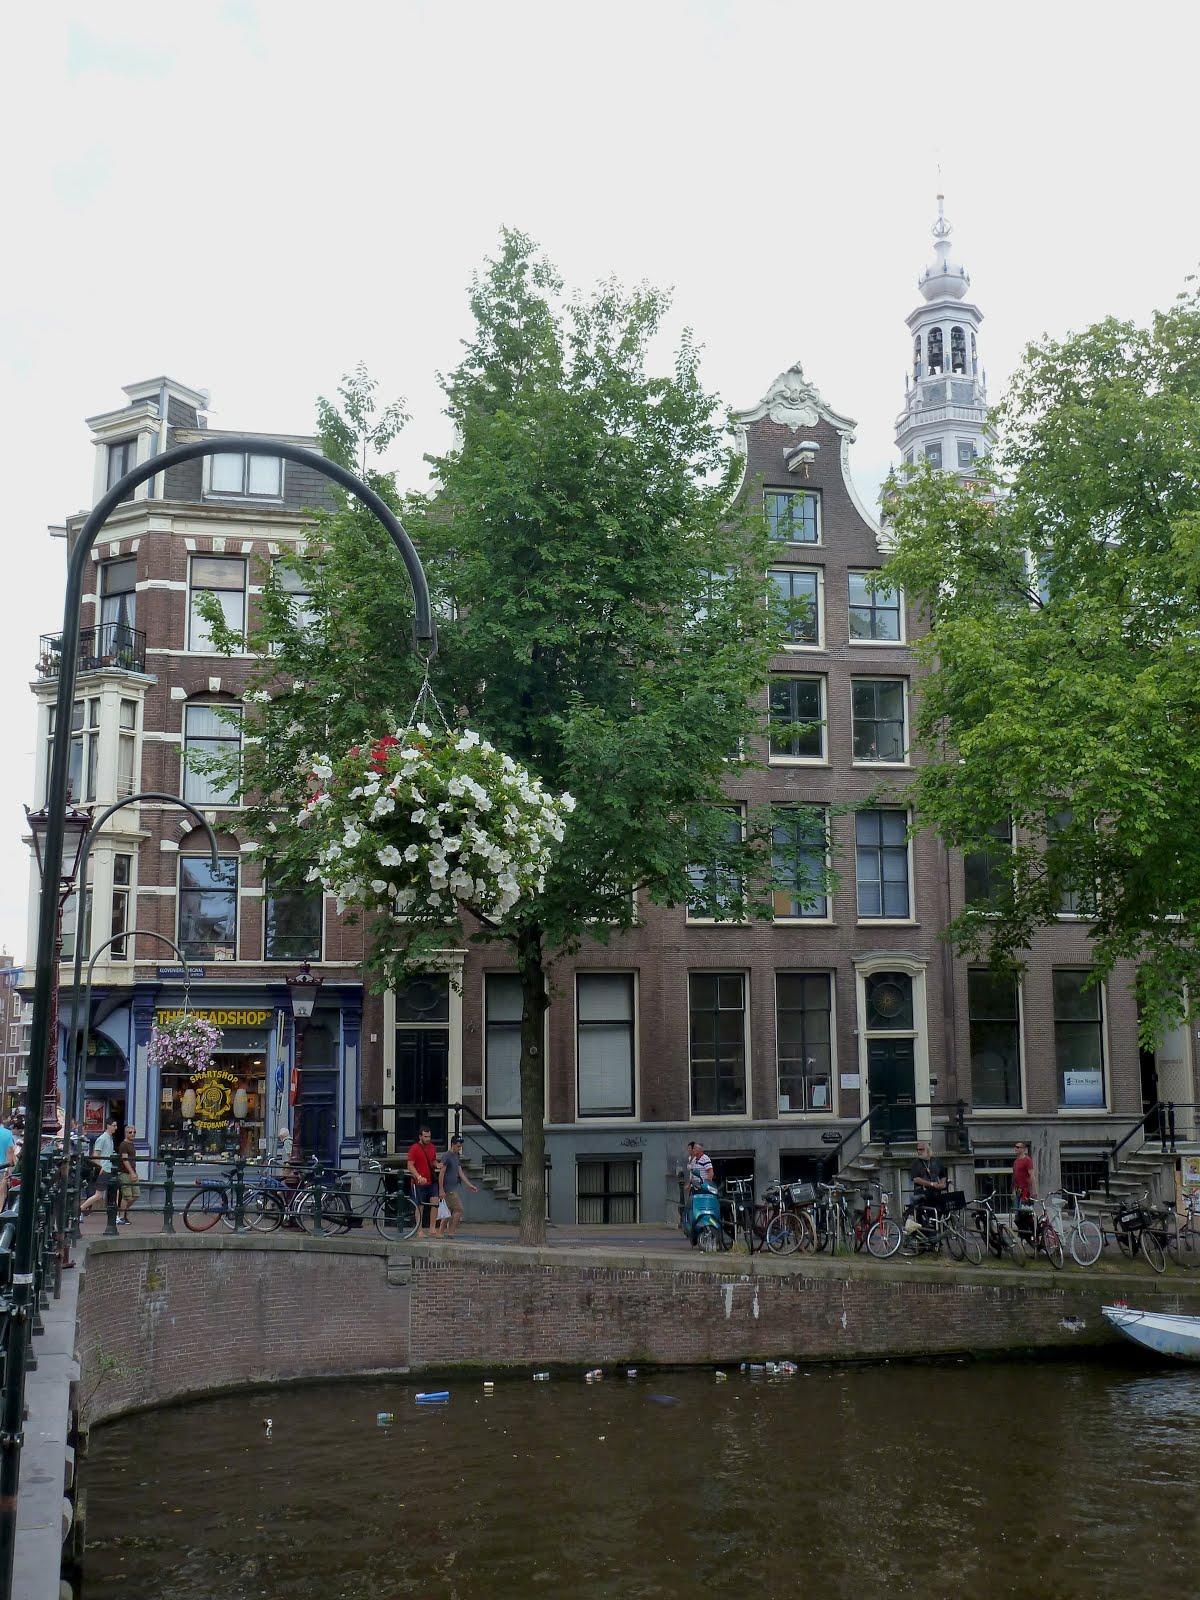 Europe 2014: Amsterdam